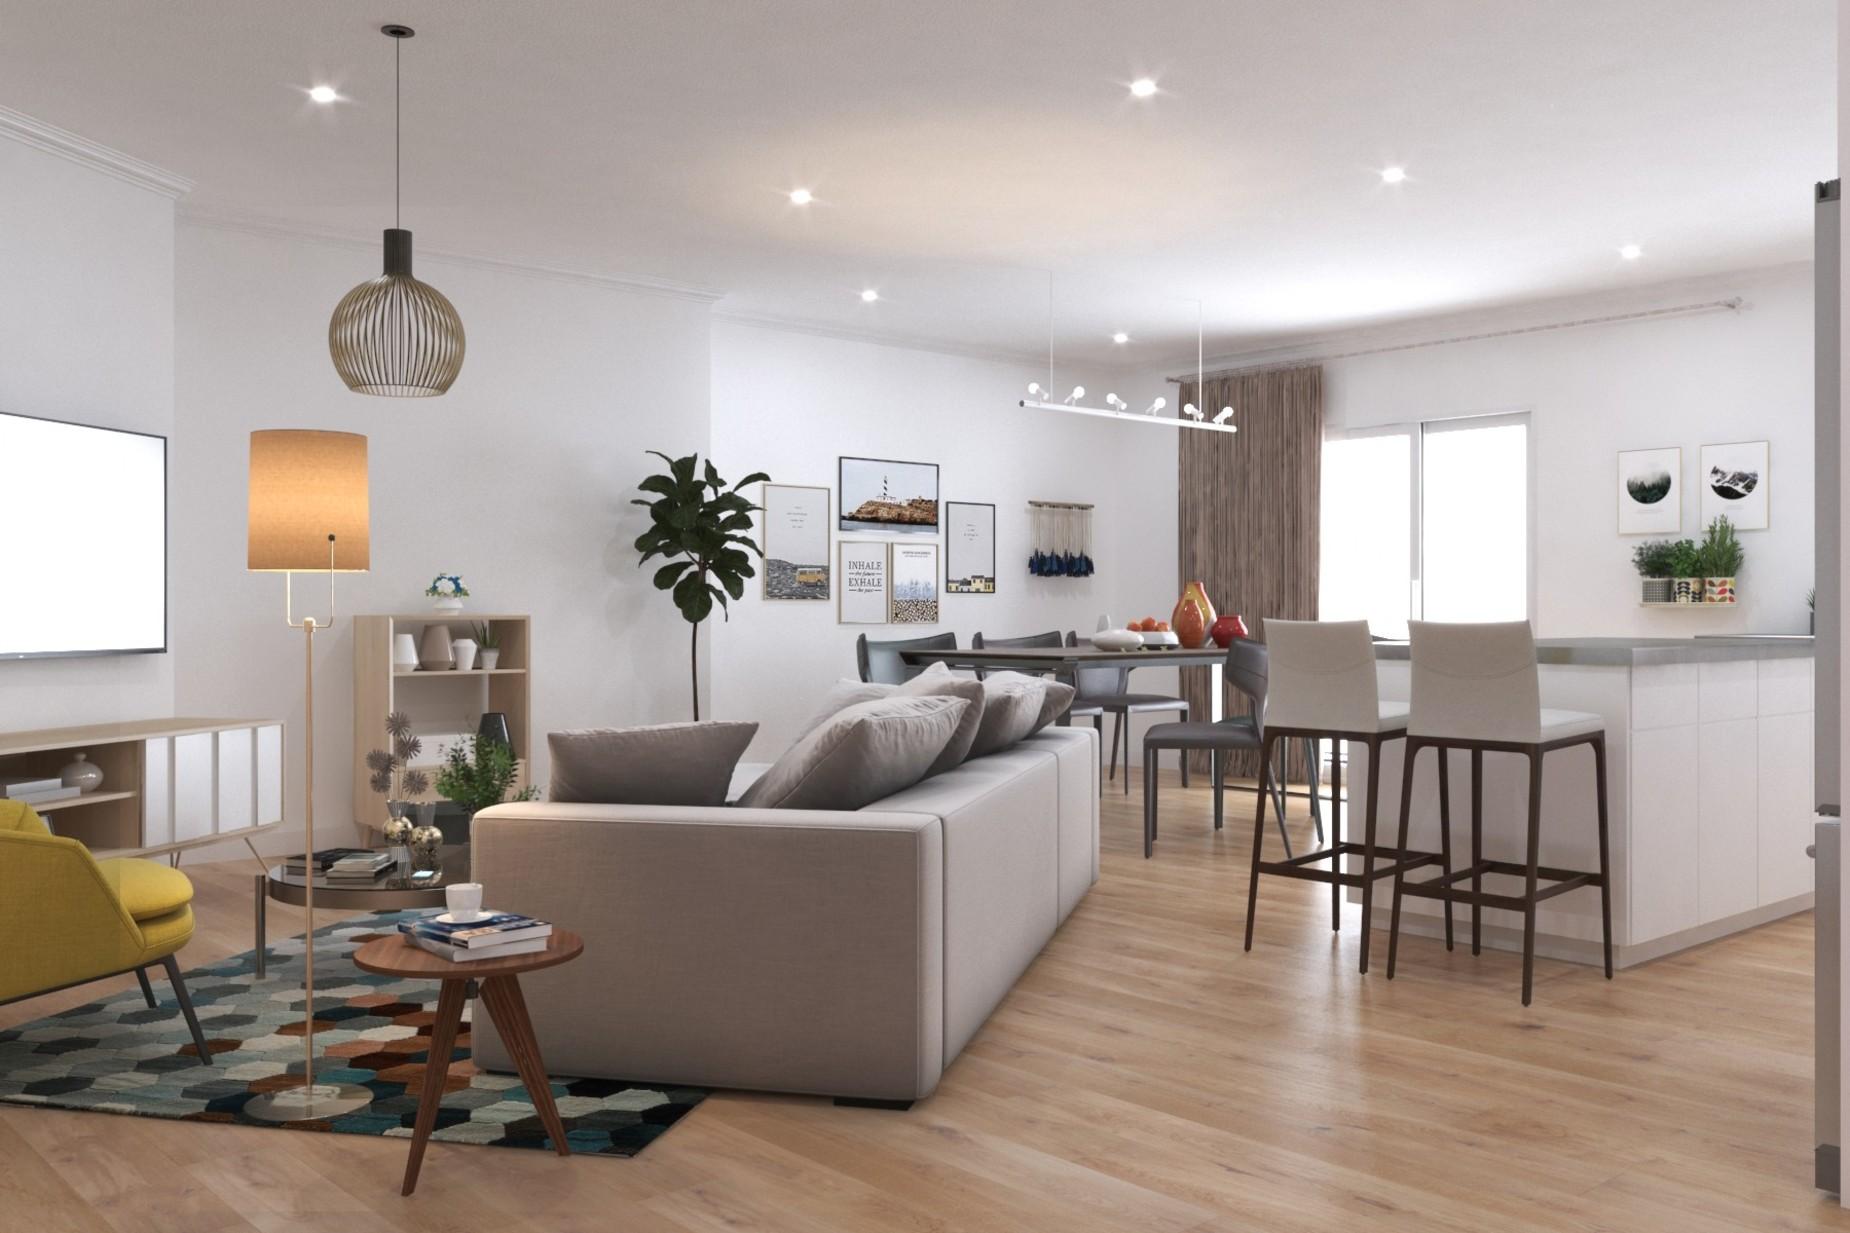 2 bed Apartment For Sale in Birkirkara, Birkirkara - thumb 4